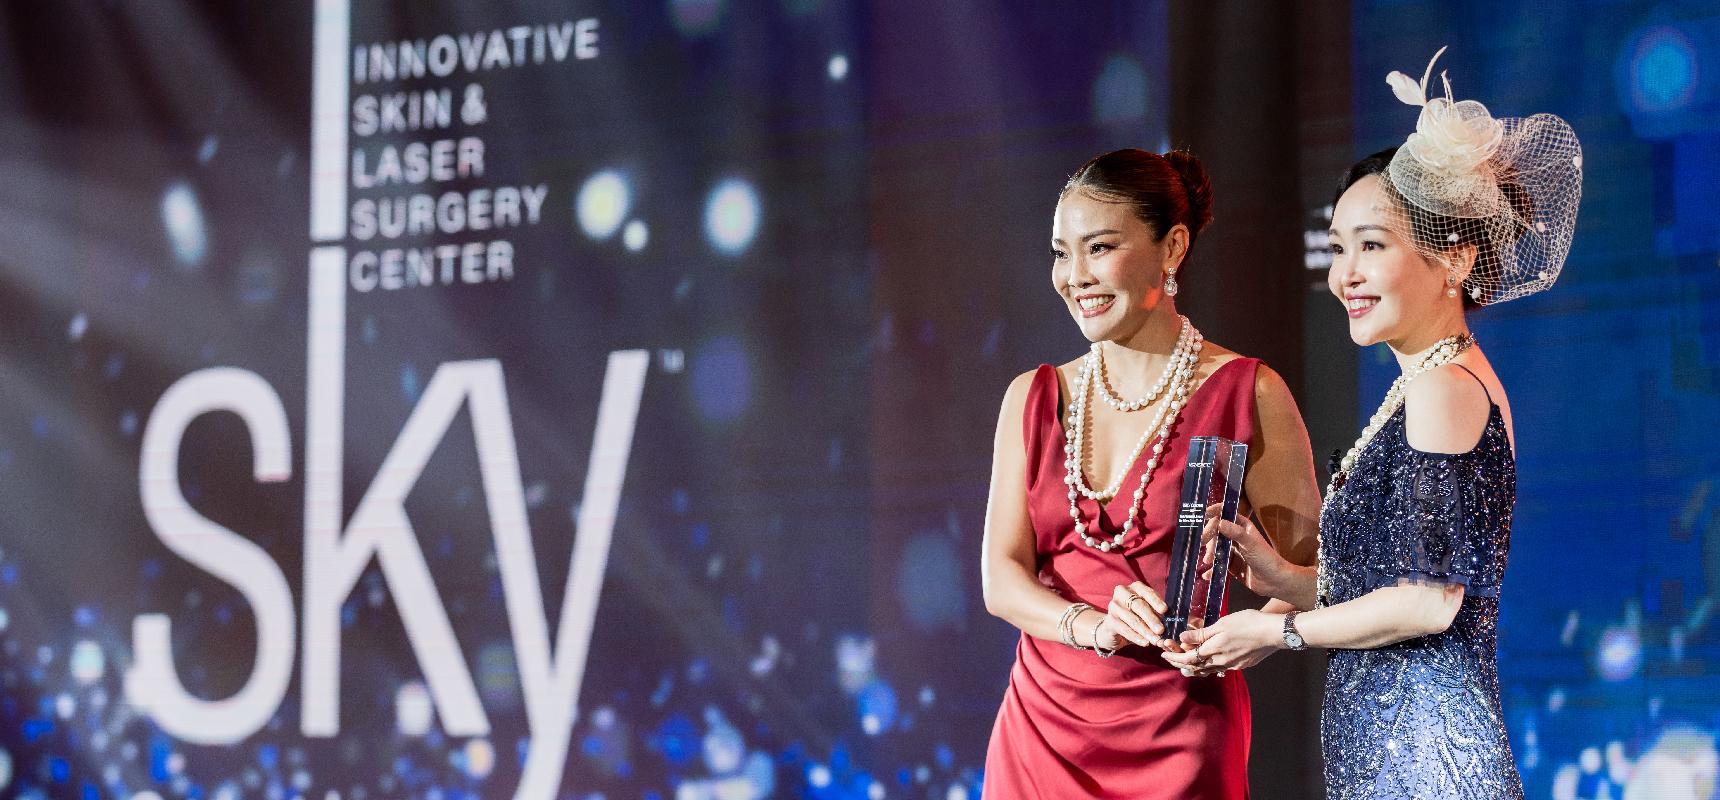 iSKY รับรางวัลคลินิกที่มียอดใช้ Xeomin โบเยอรมันสูงสุดระดับ Platinum